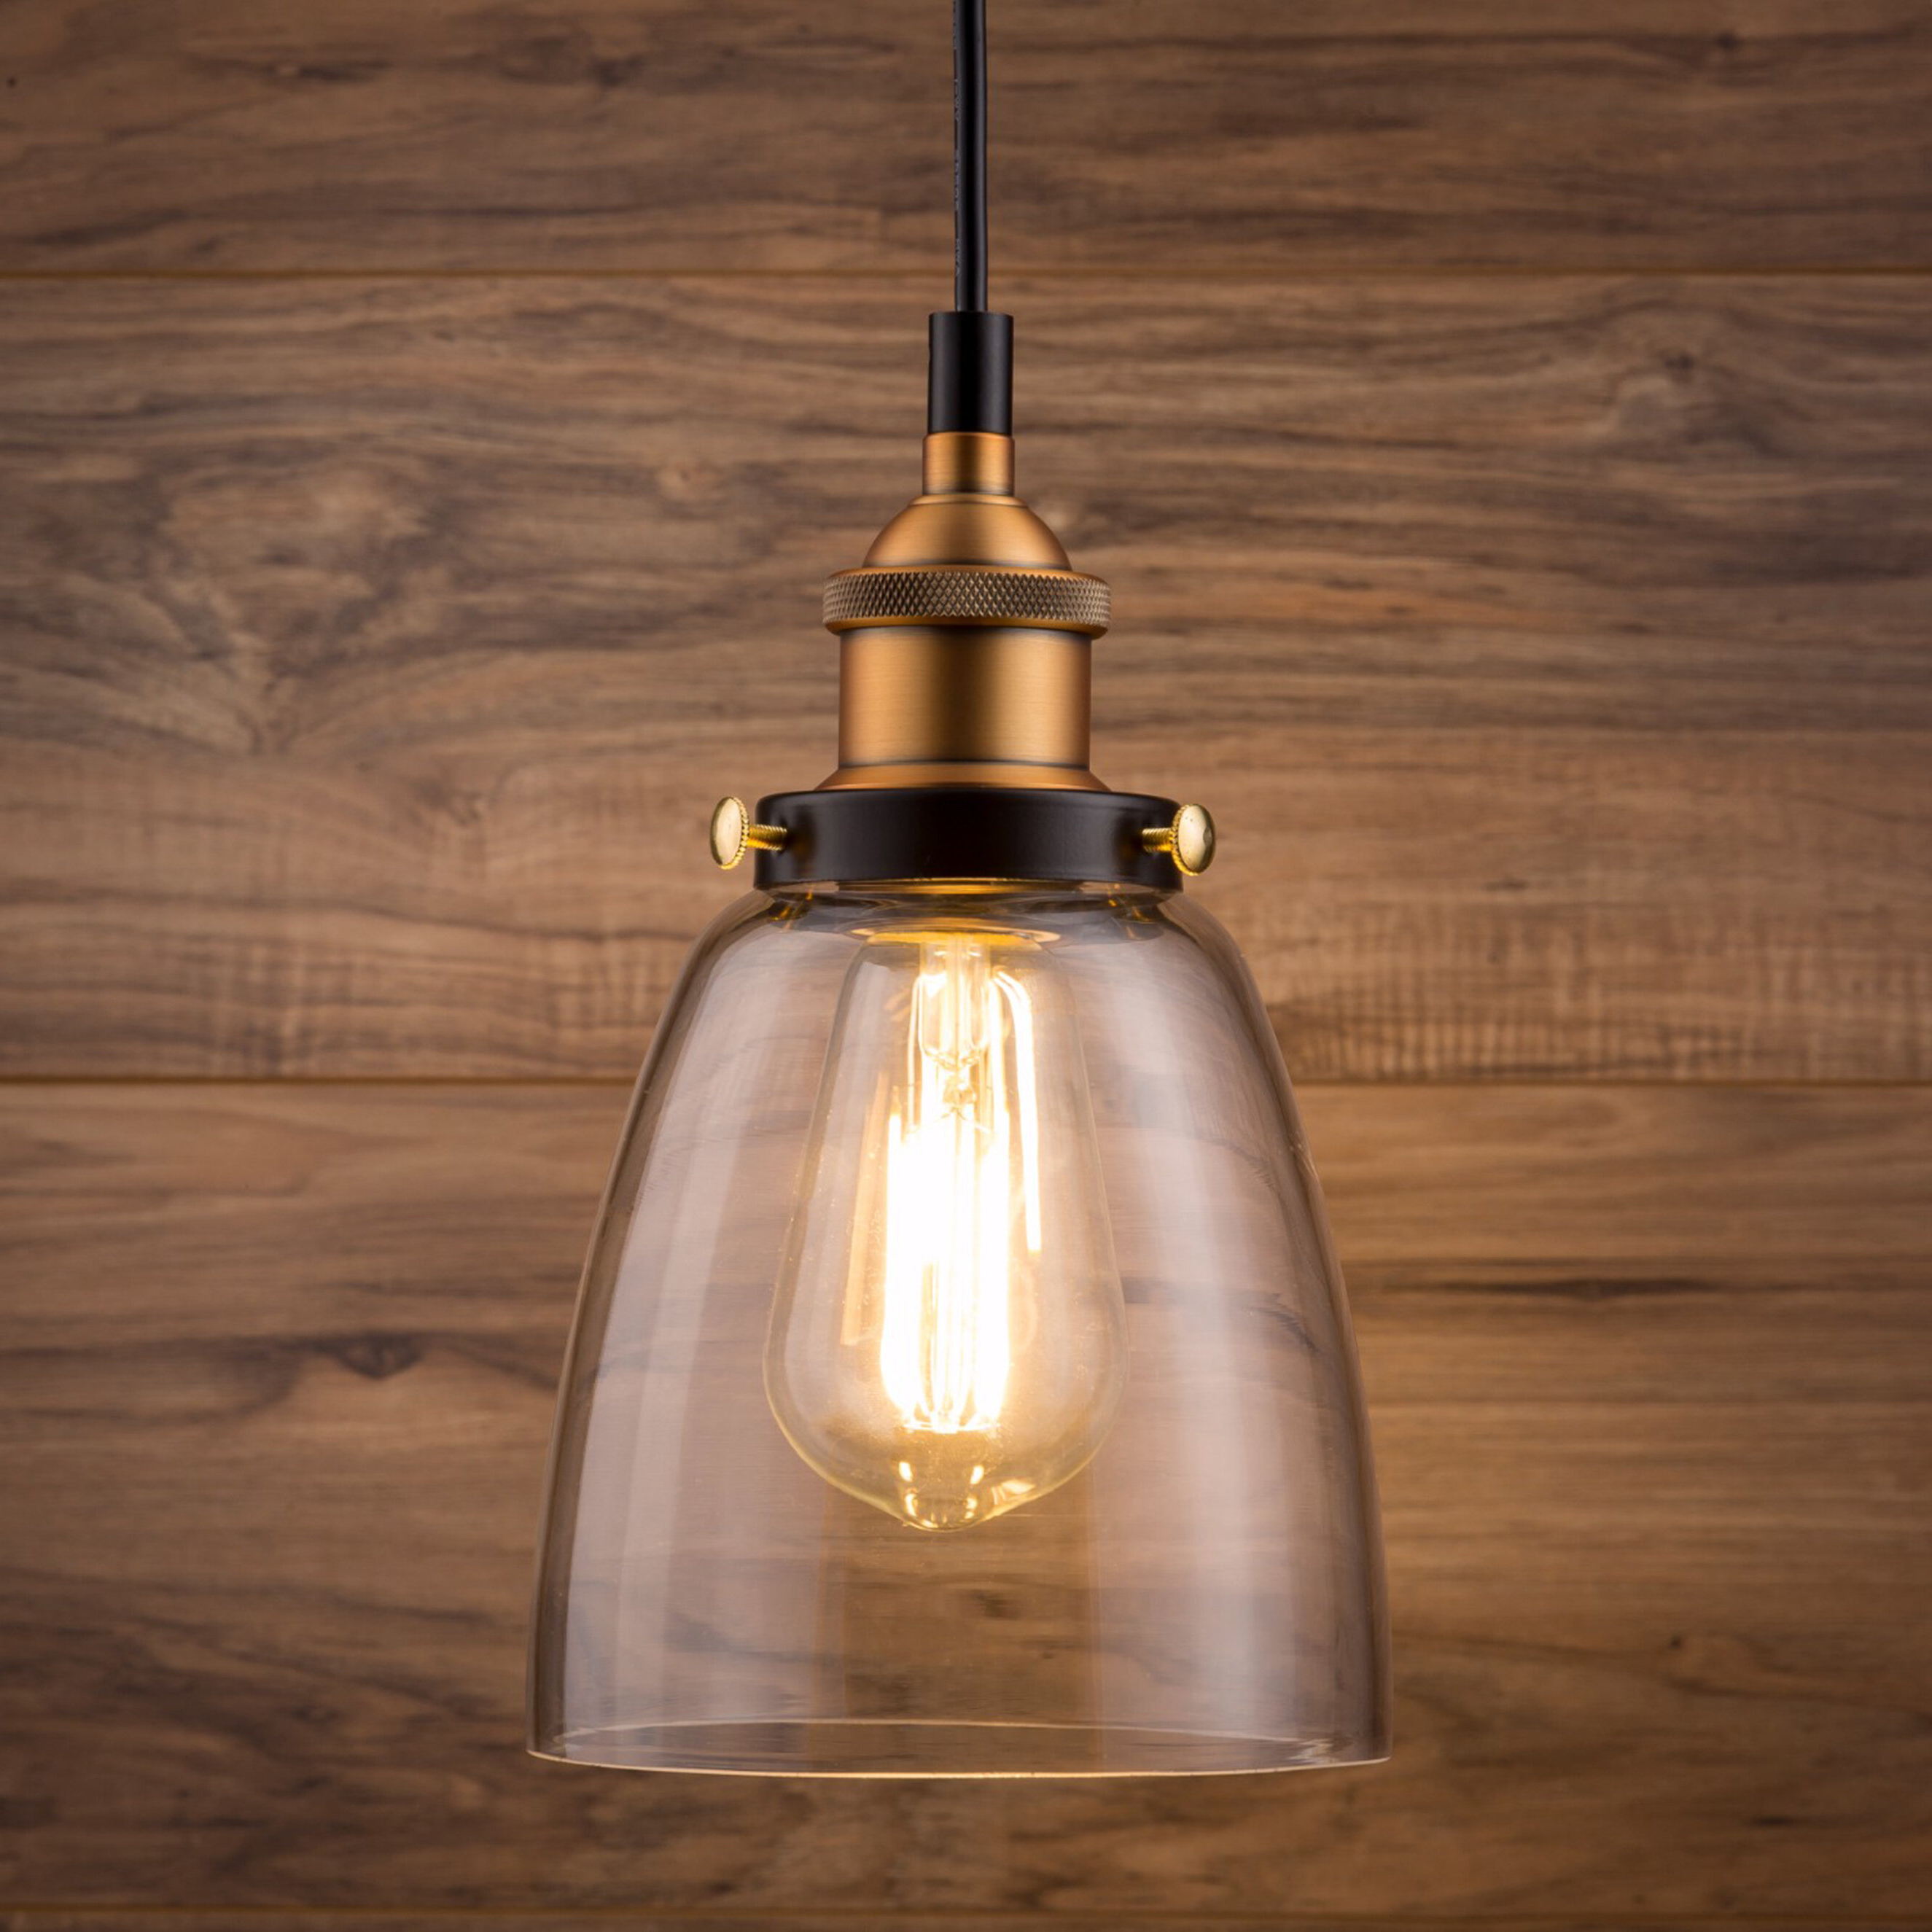 1 Light Single Bell Pendants In Well Known Bundaberg 1 Light Single Bell Pendant (View 2 of 20)